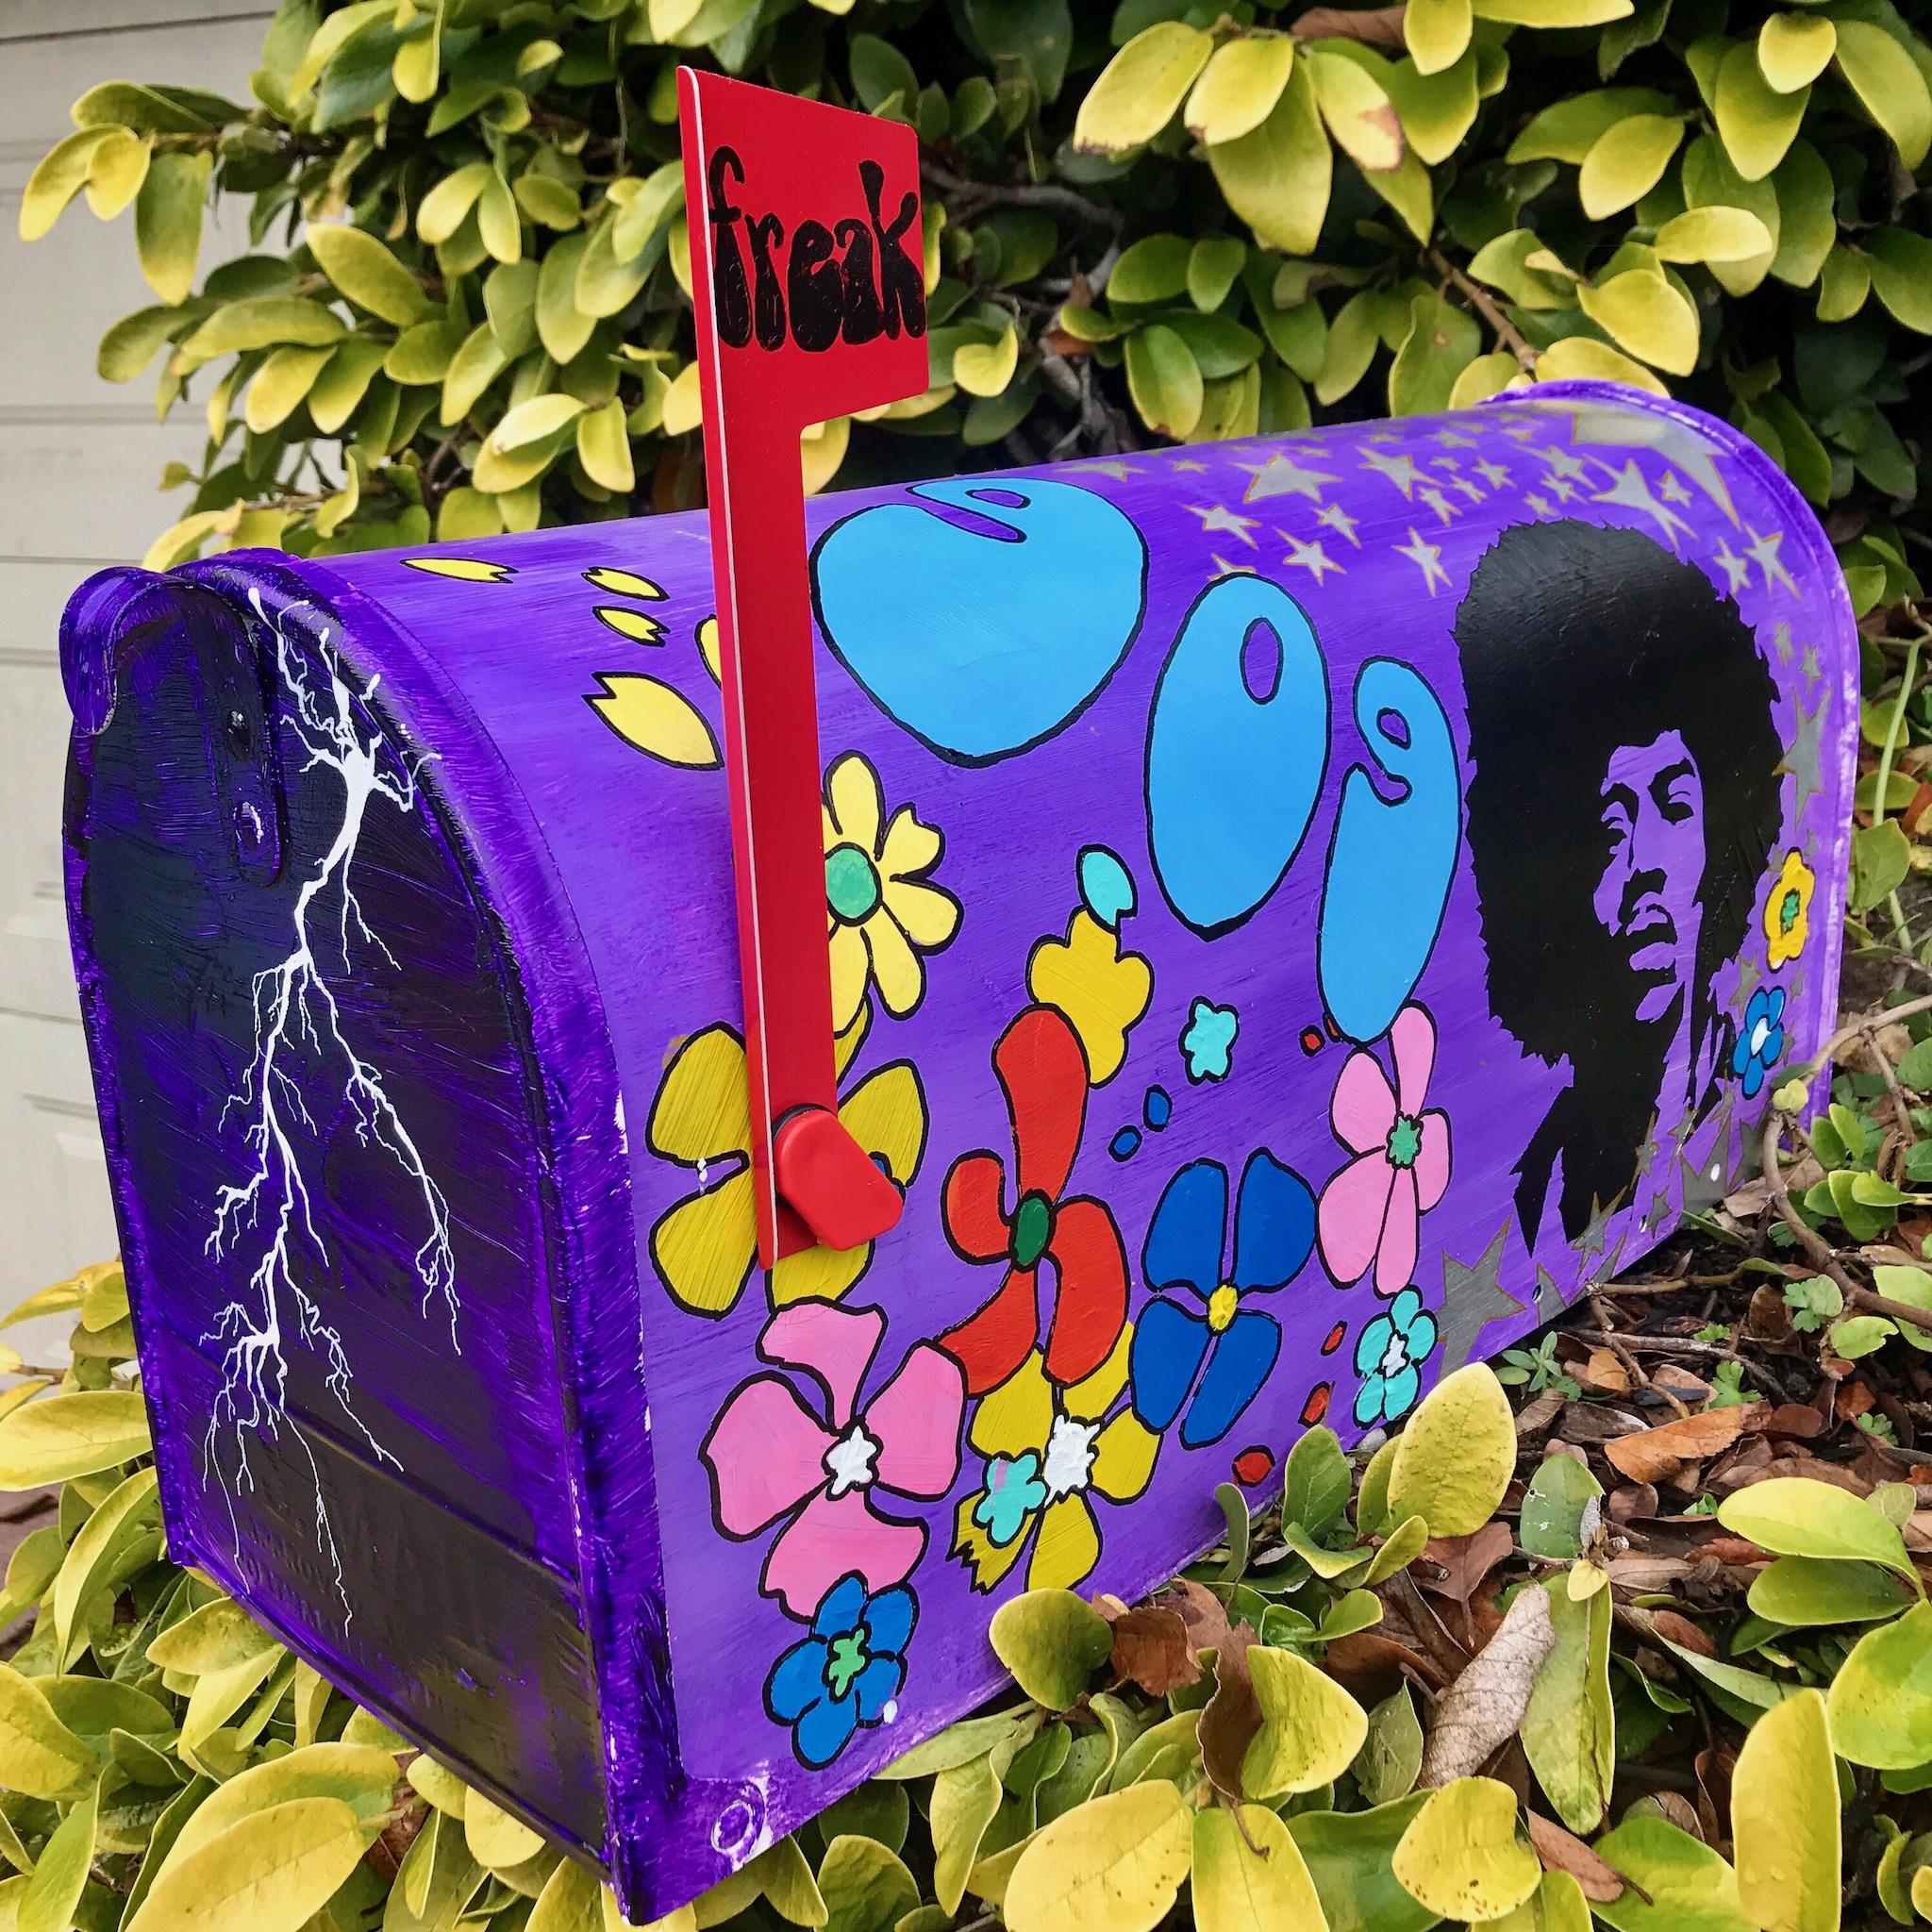 Ian's home mailbox